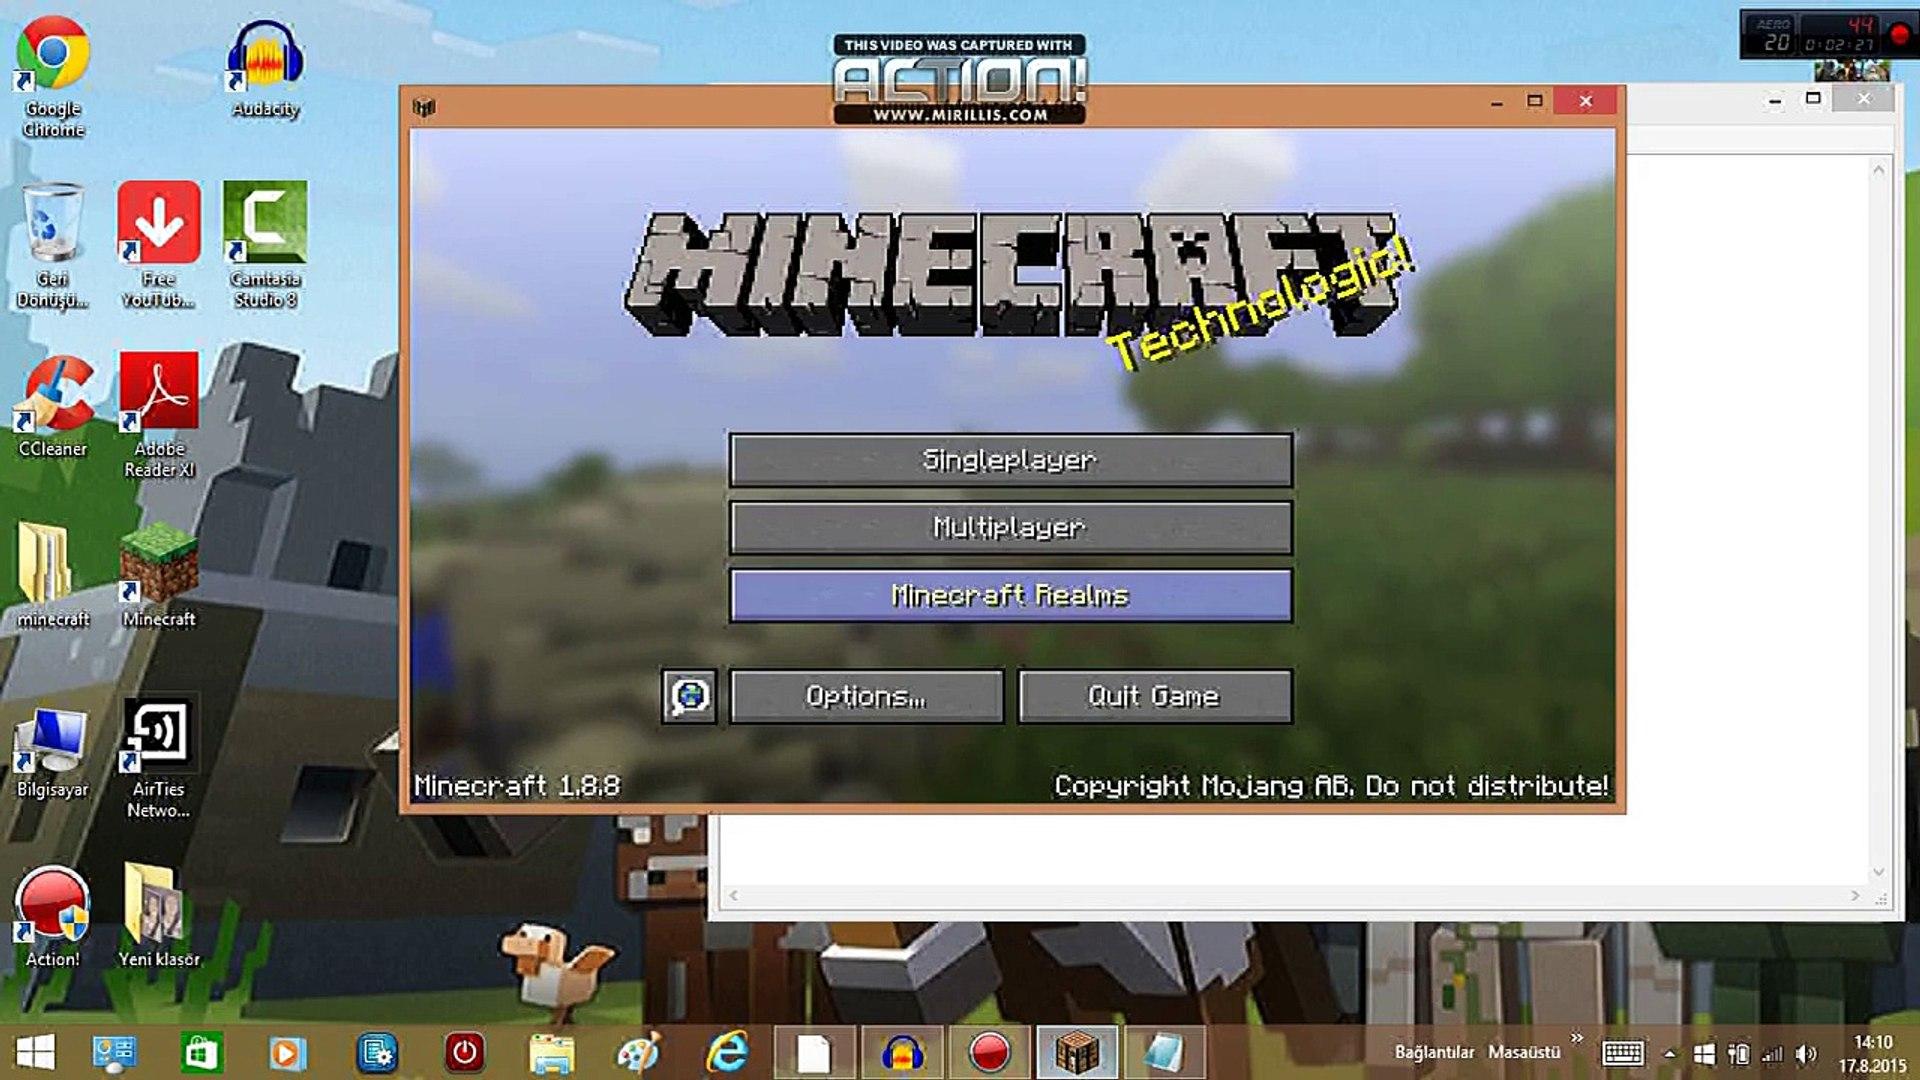 minecraft 1.7 10 server premiumsuz